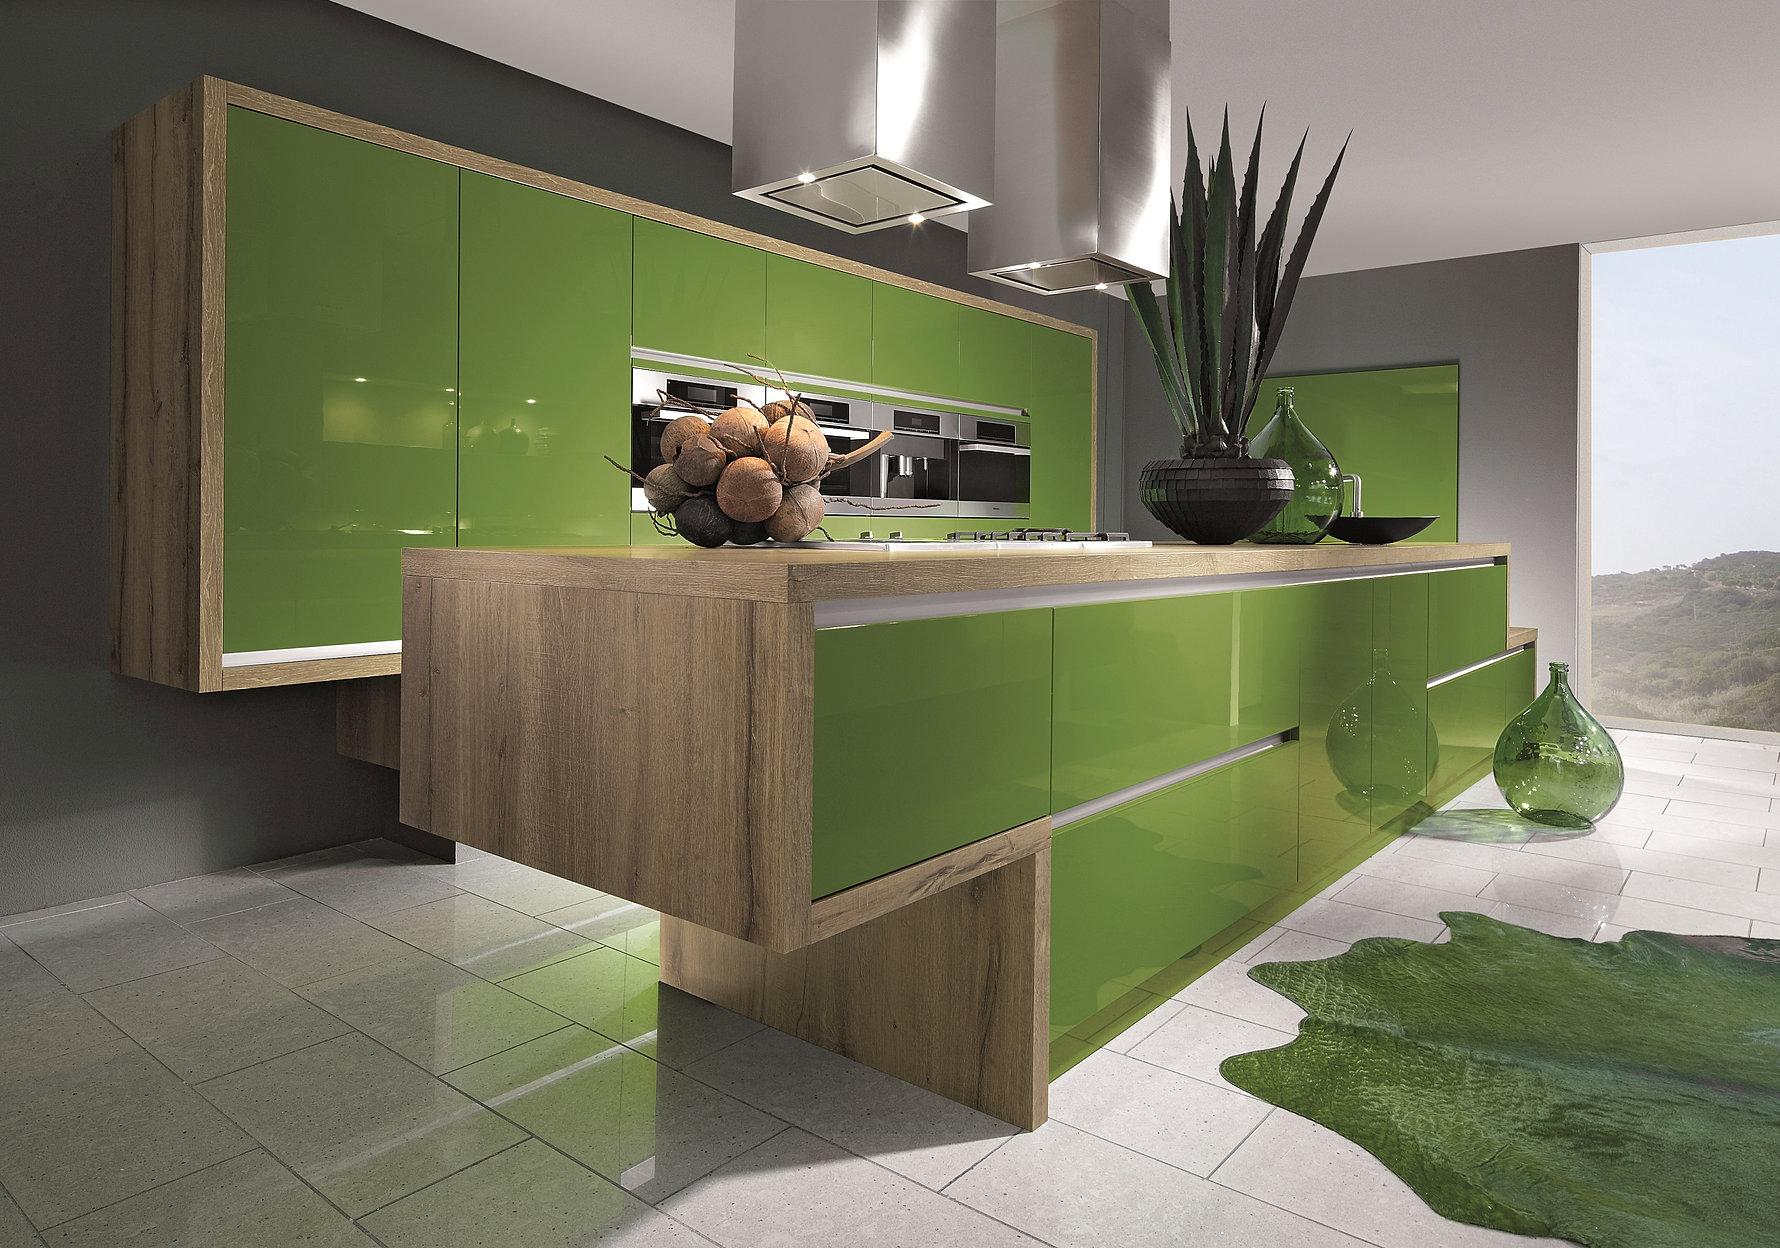 Idee Salle De Bain Original : Installation de cuisines